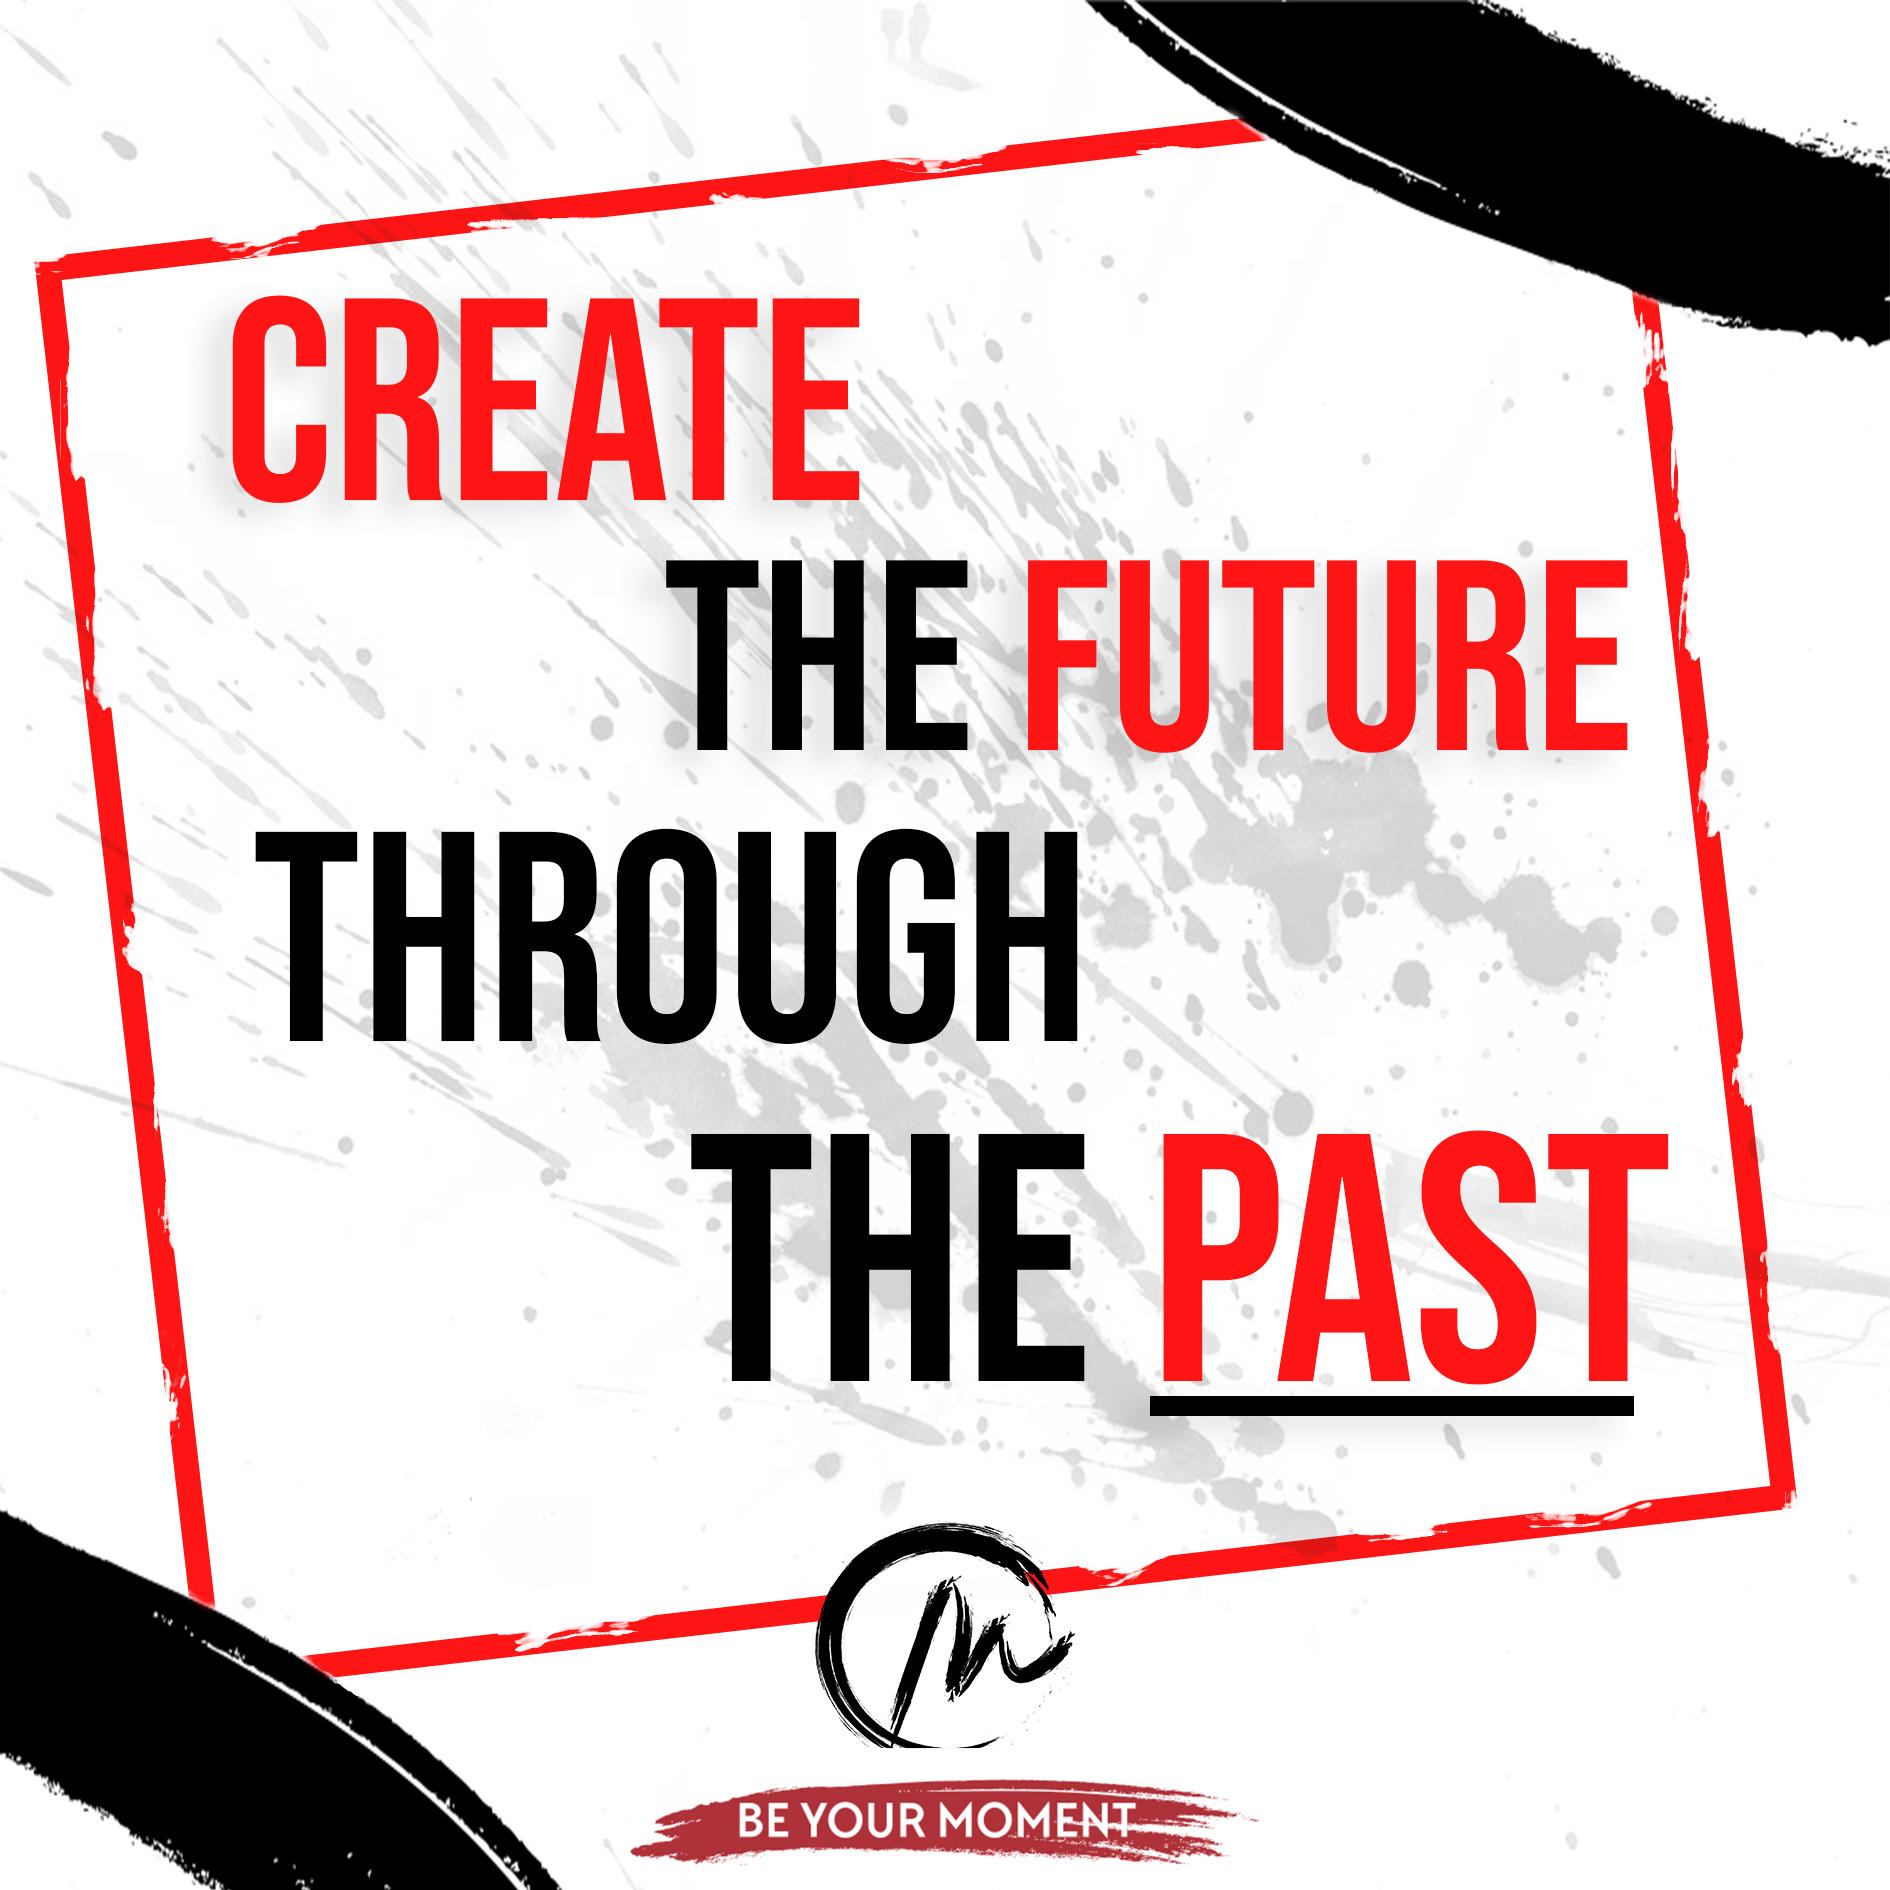 10. Create The Futre Through The Past - (White) .jpg